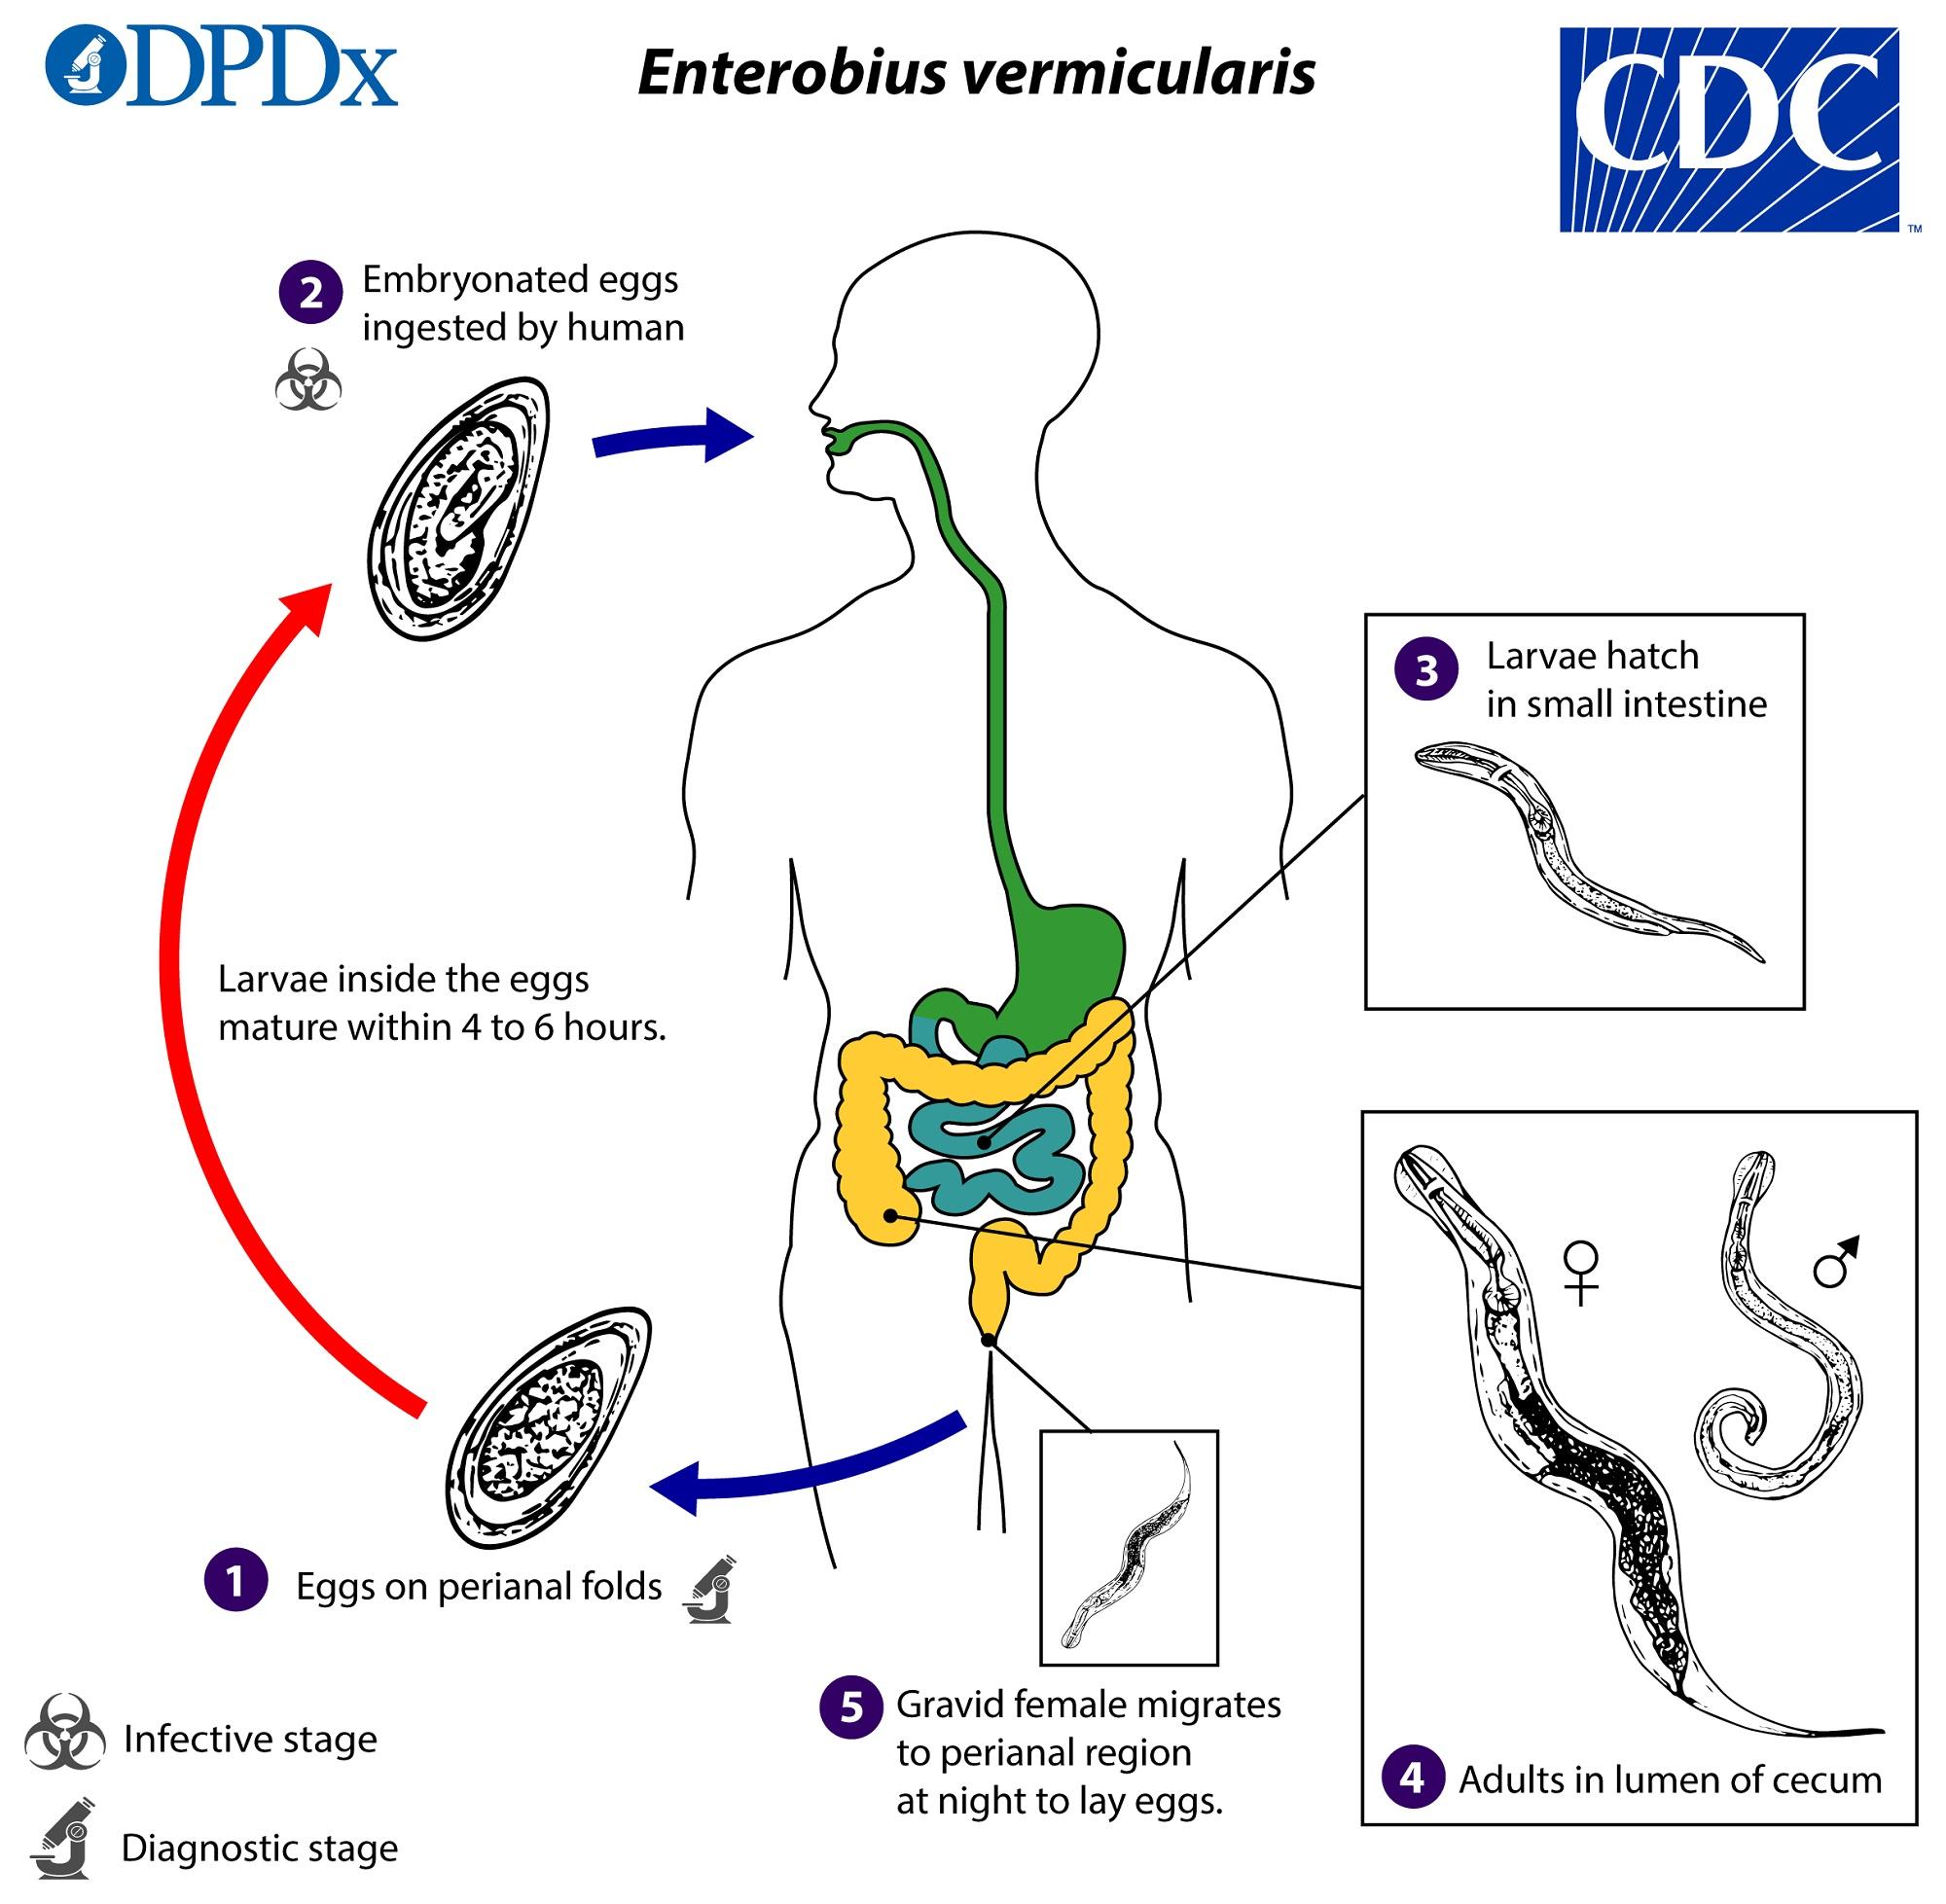 asspub.ro - Paraziţii din noi. Enterobius vermicularis